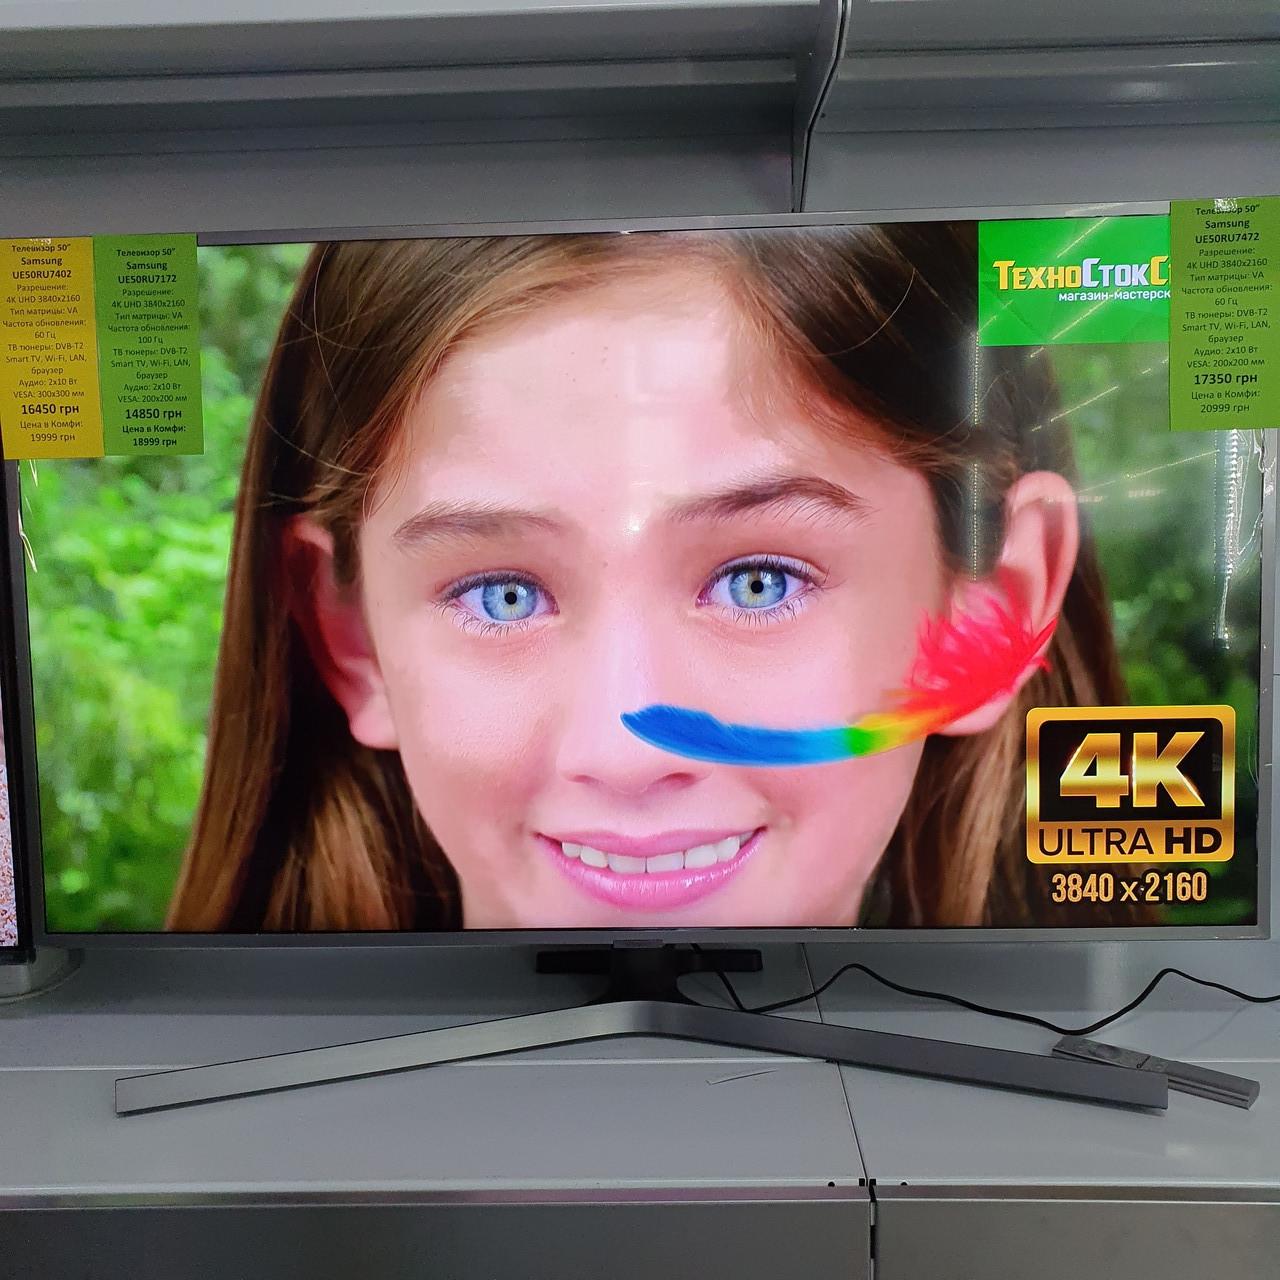 Телевизор 50Samsung UE50RU7172 (4KUHD 3840x2160/VA / 100ГЦ / DVBT2,SmartTV)